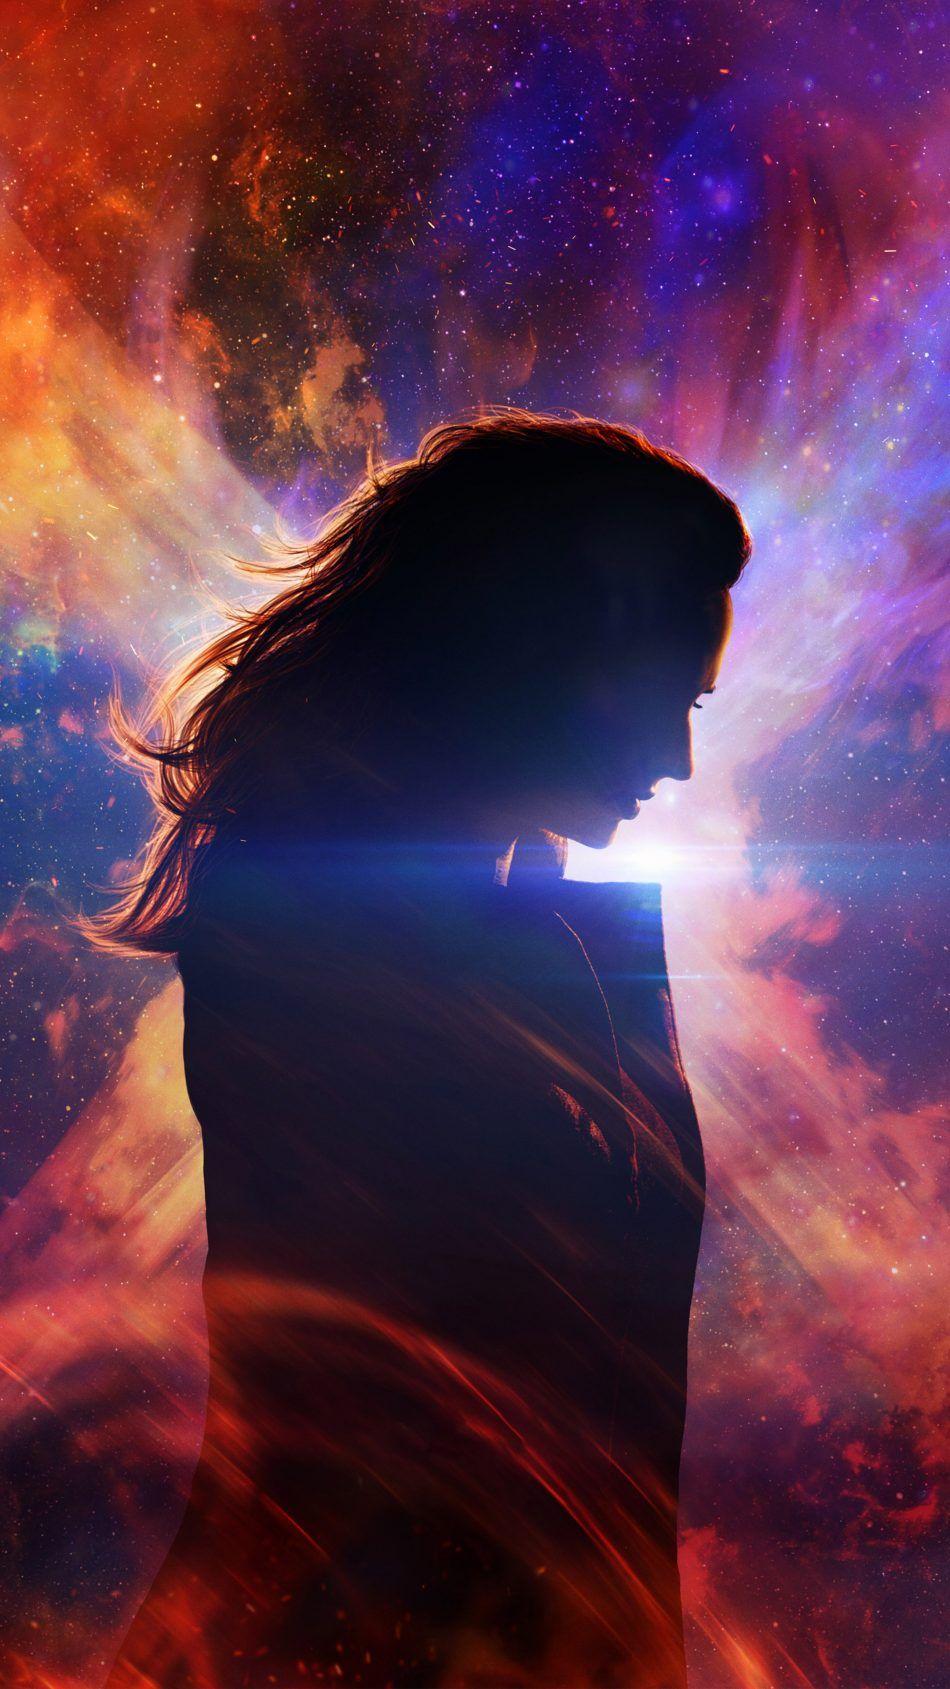 X Men Dark Phoenix 2019 4k Ultra Hd Mobile Wallpaper Dark Phoenix X Men Marvel